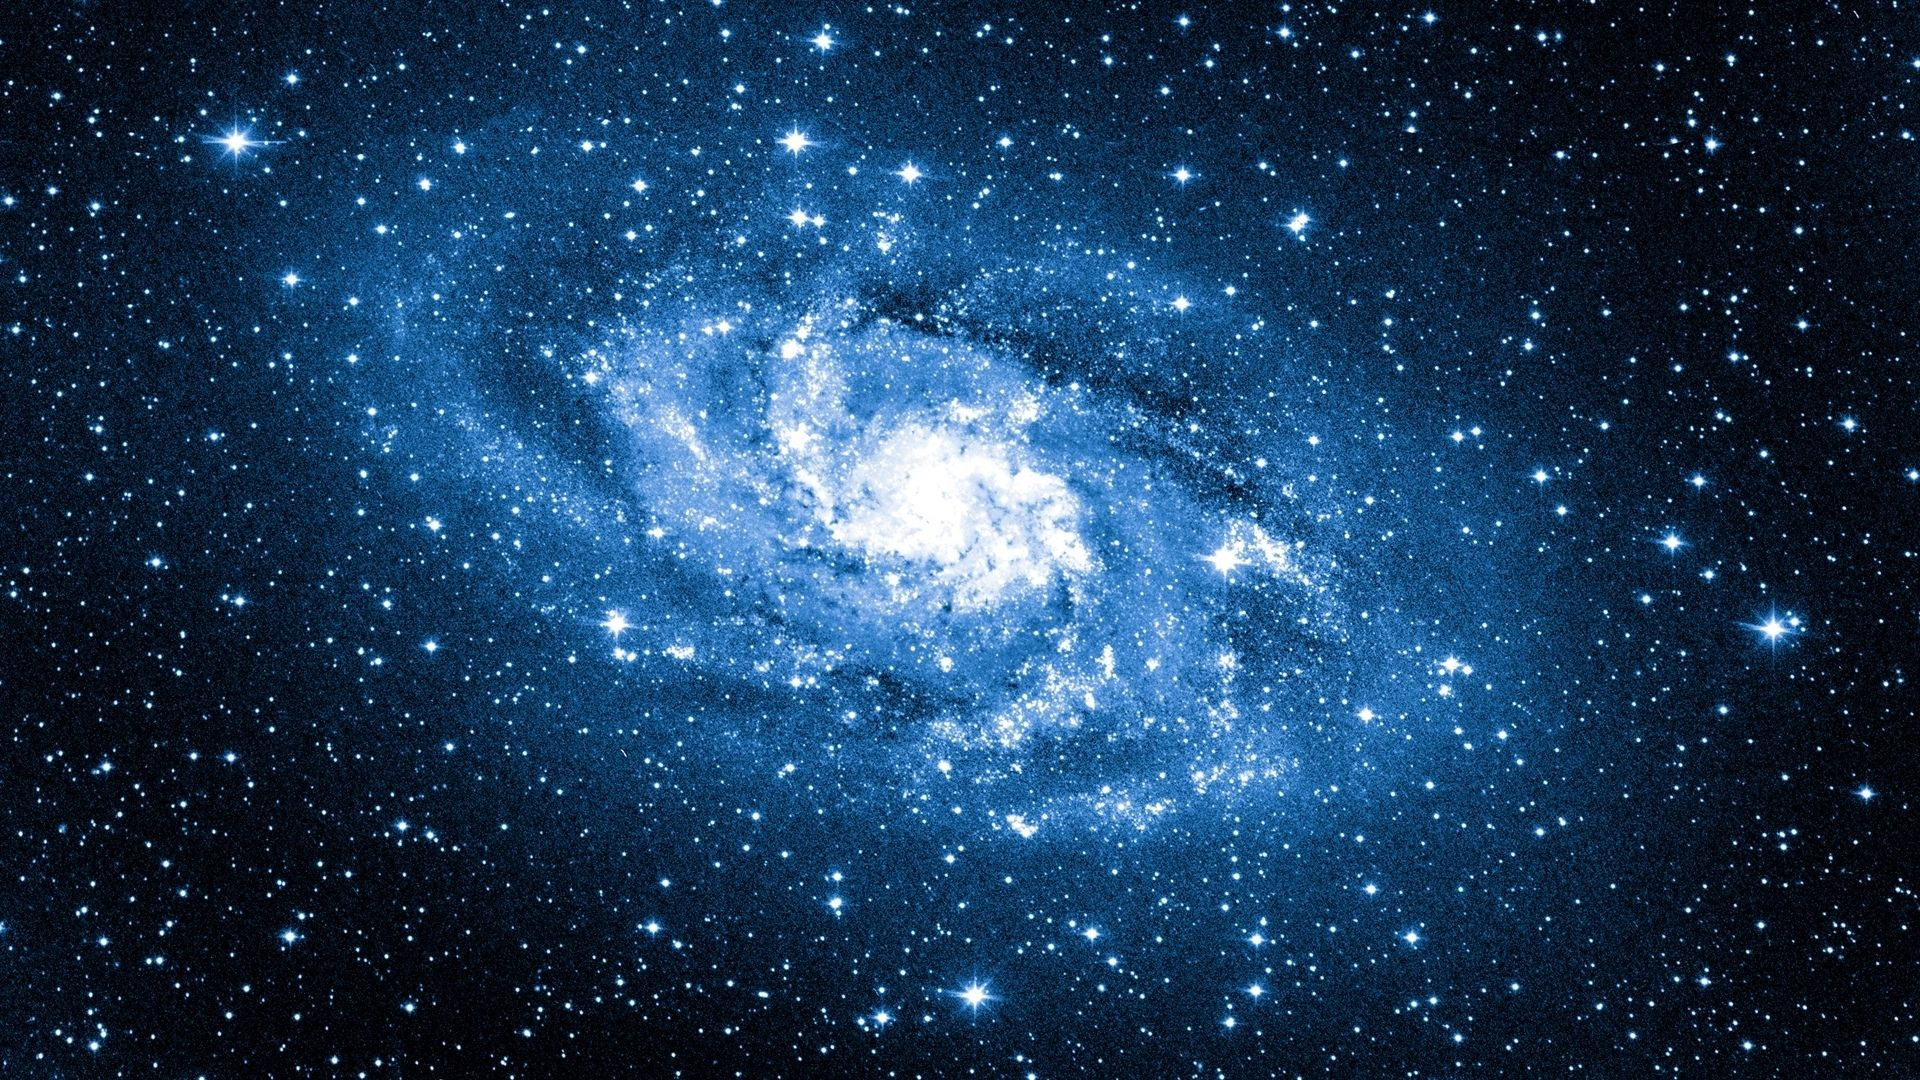 Astronomy free image